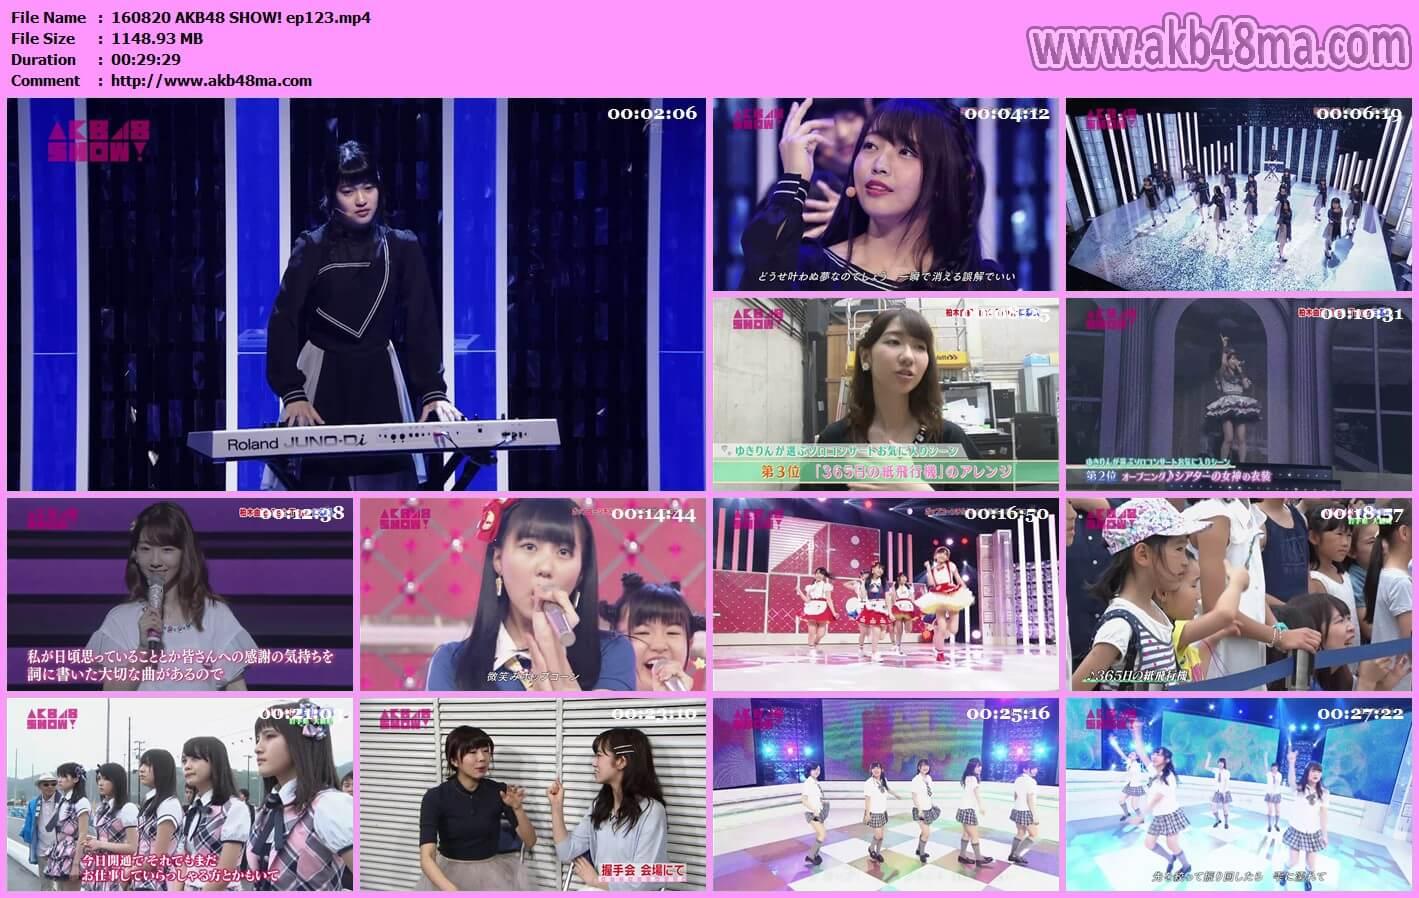 AKB48 SHOW